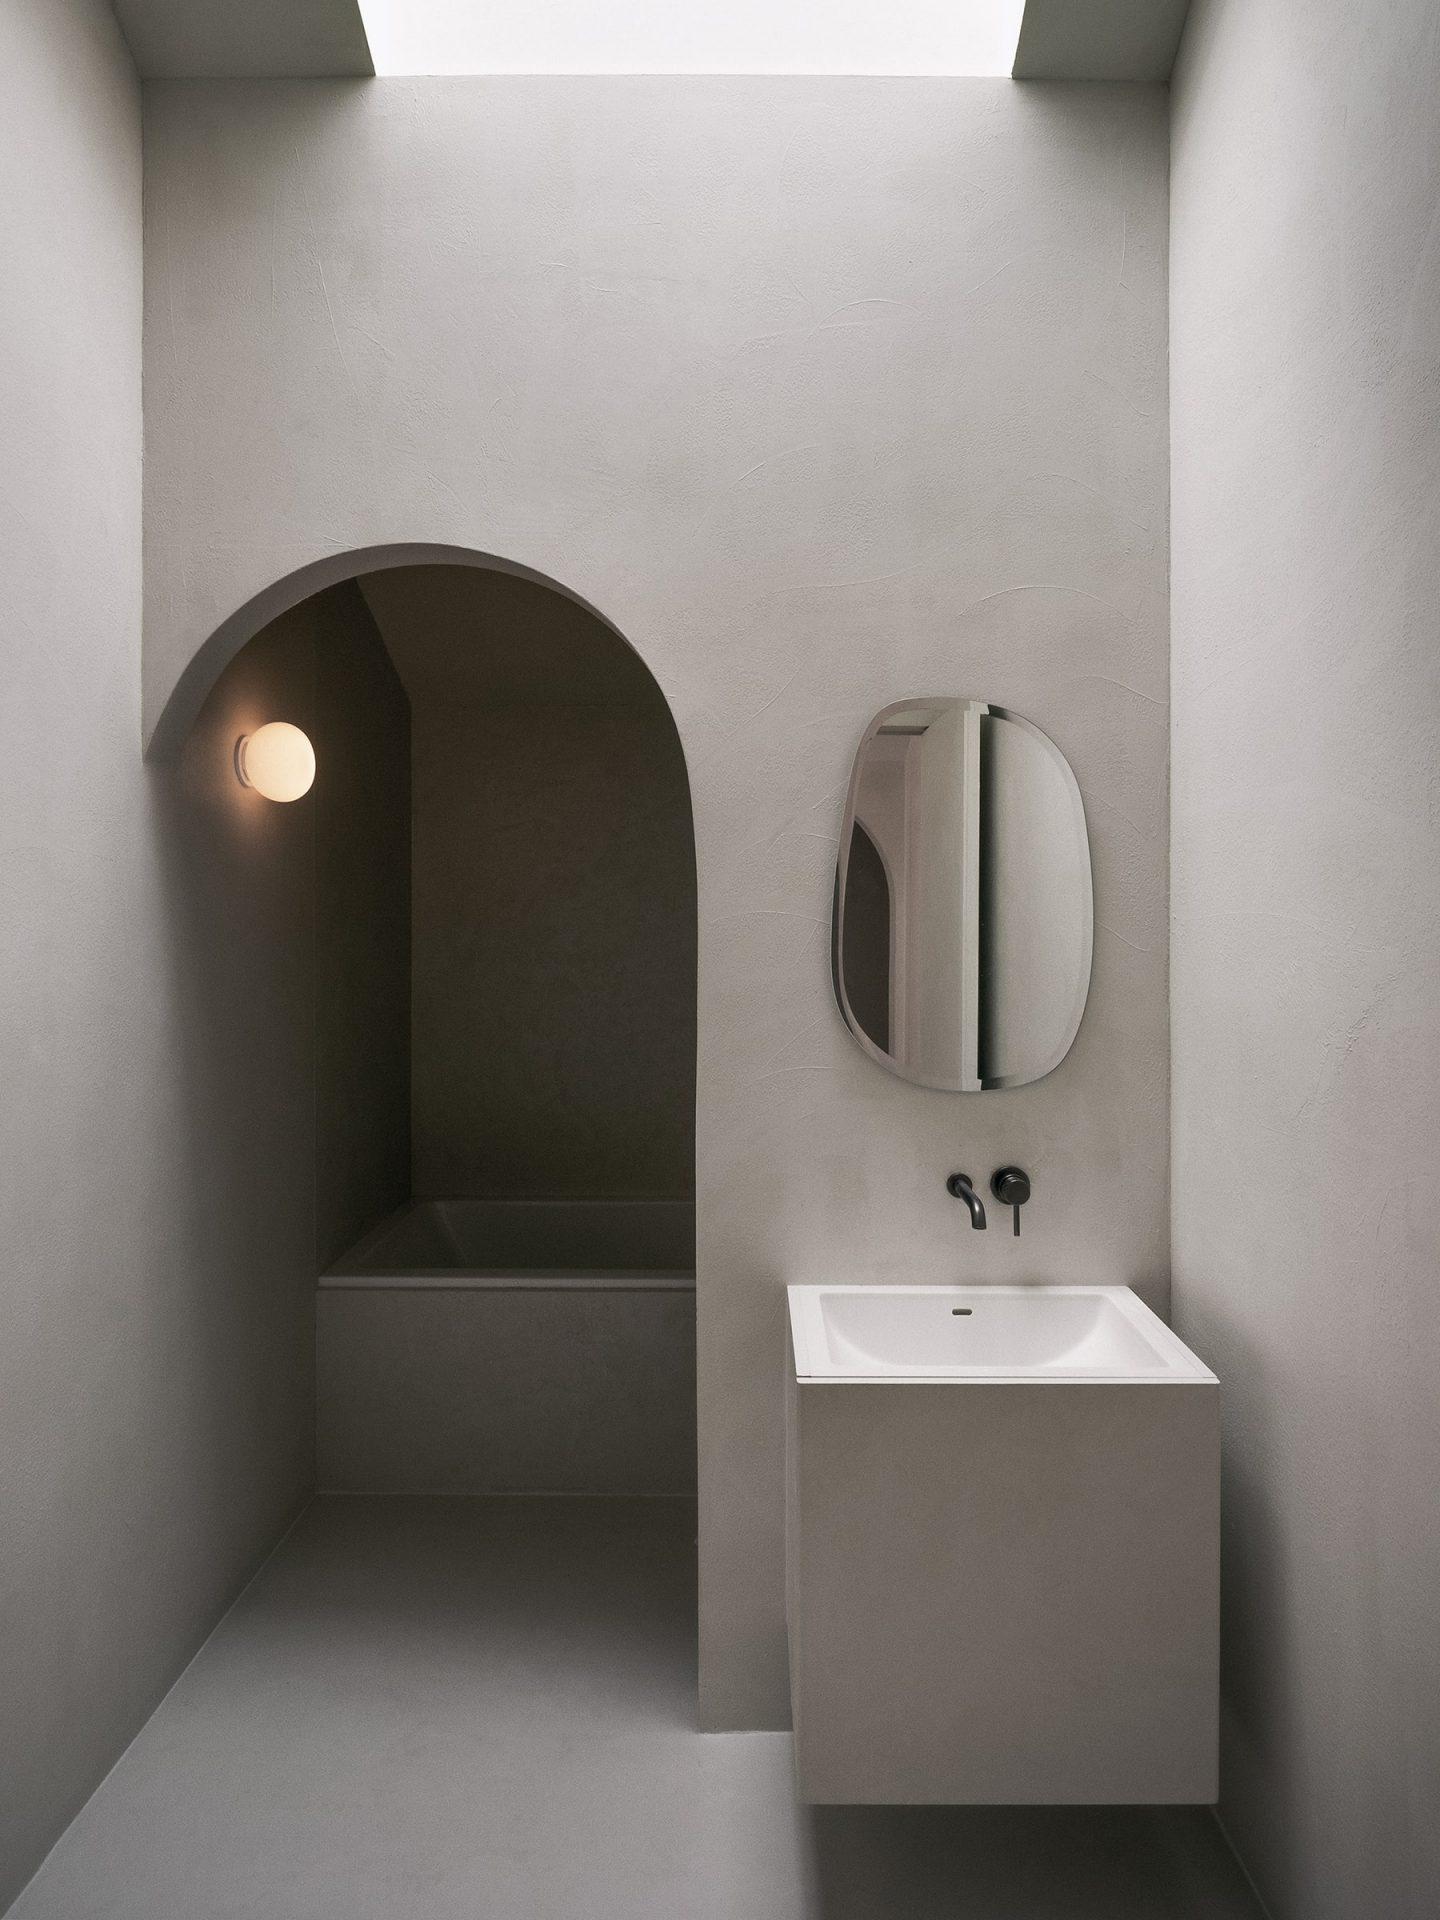 #IGNANT-Architecture-Residential-NORM-AlainCarleArchitecte-©-F.-Michaud-14